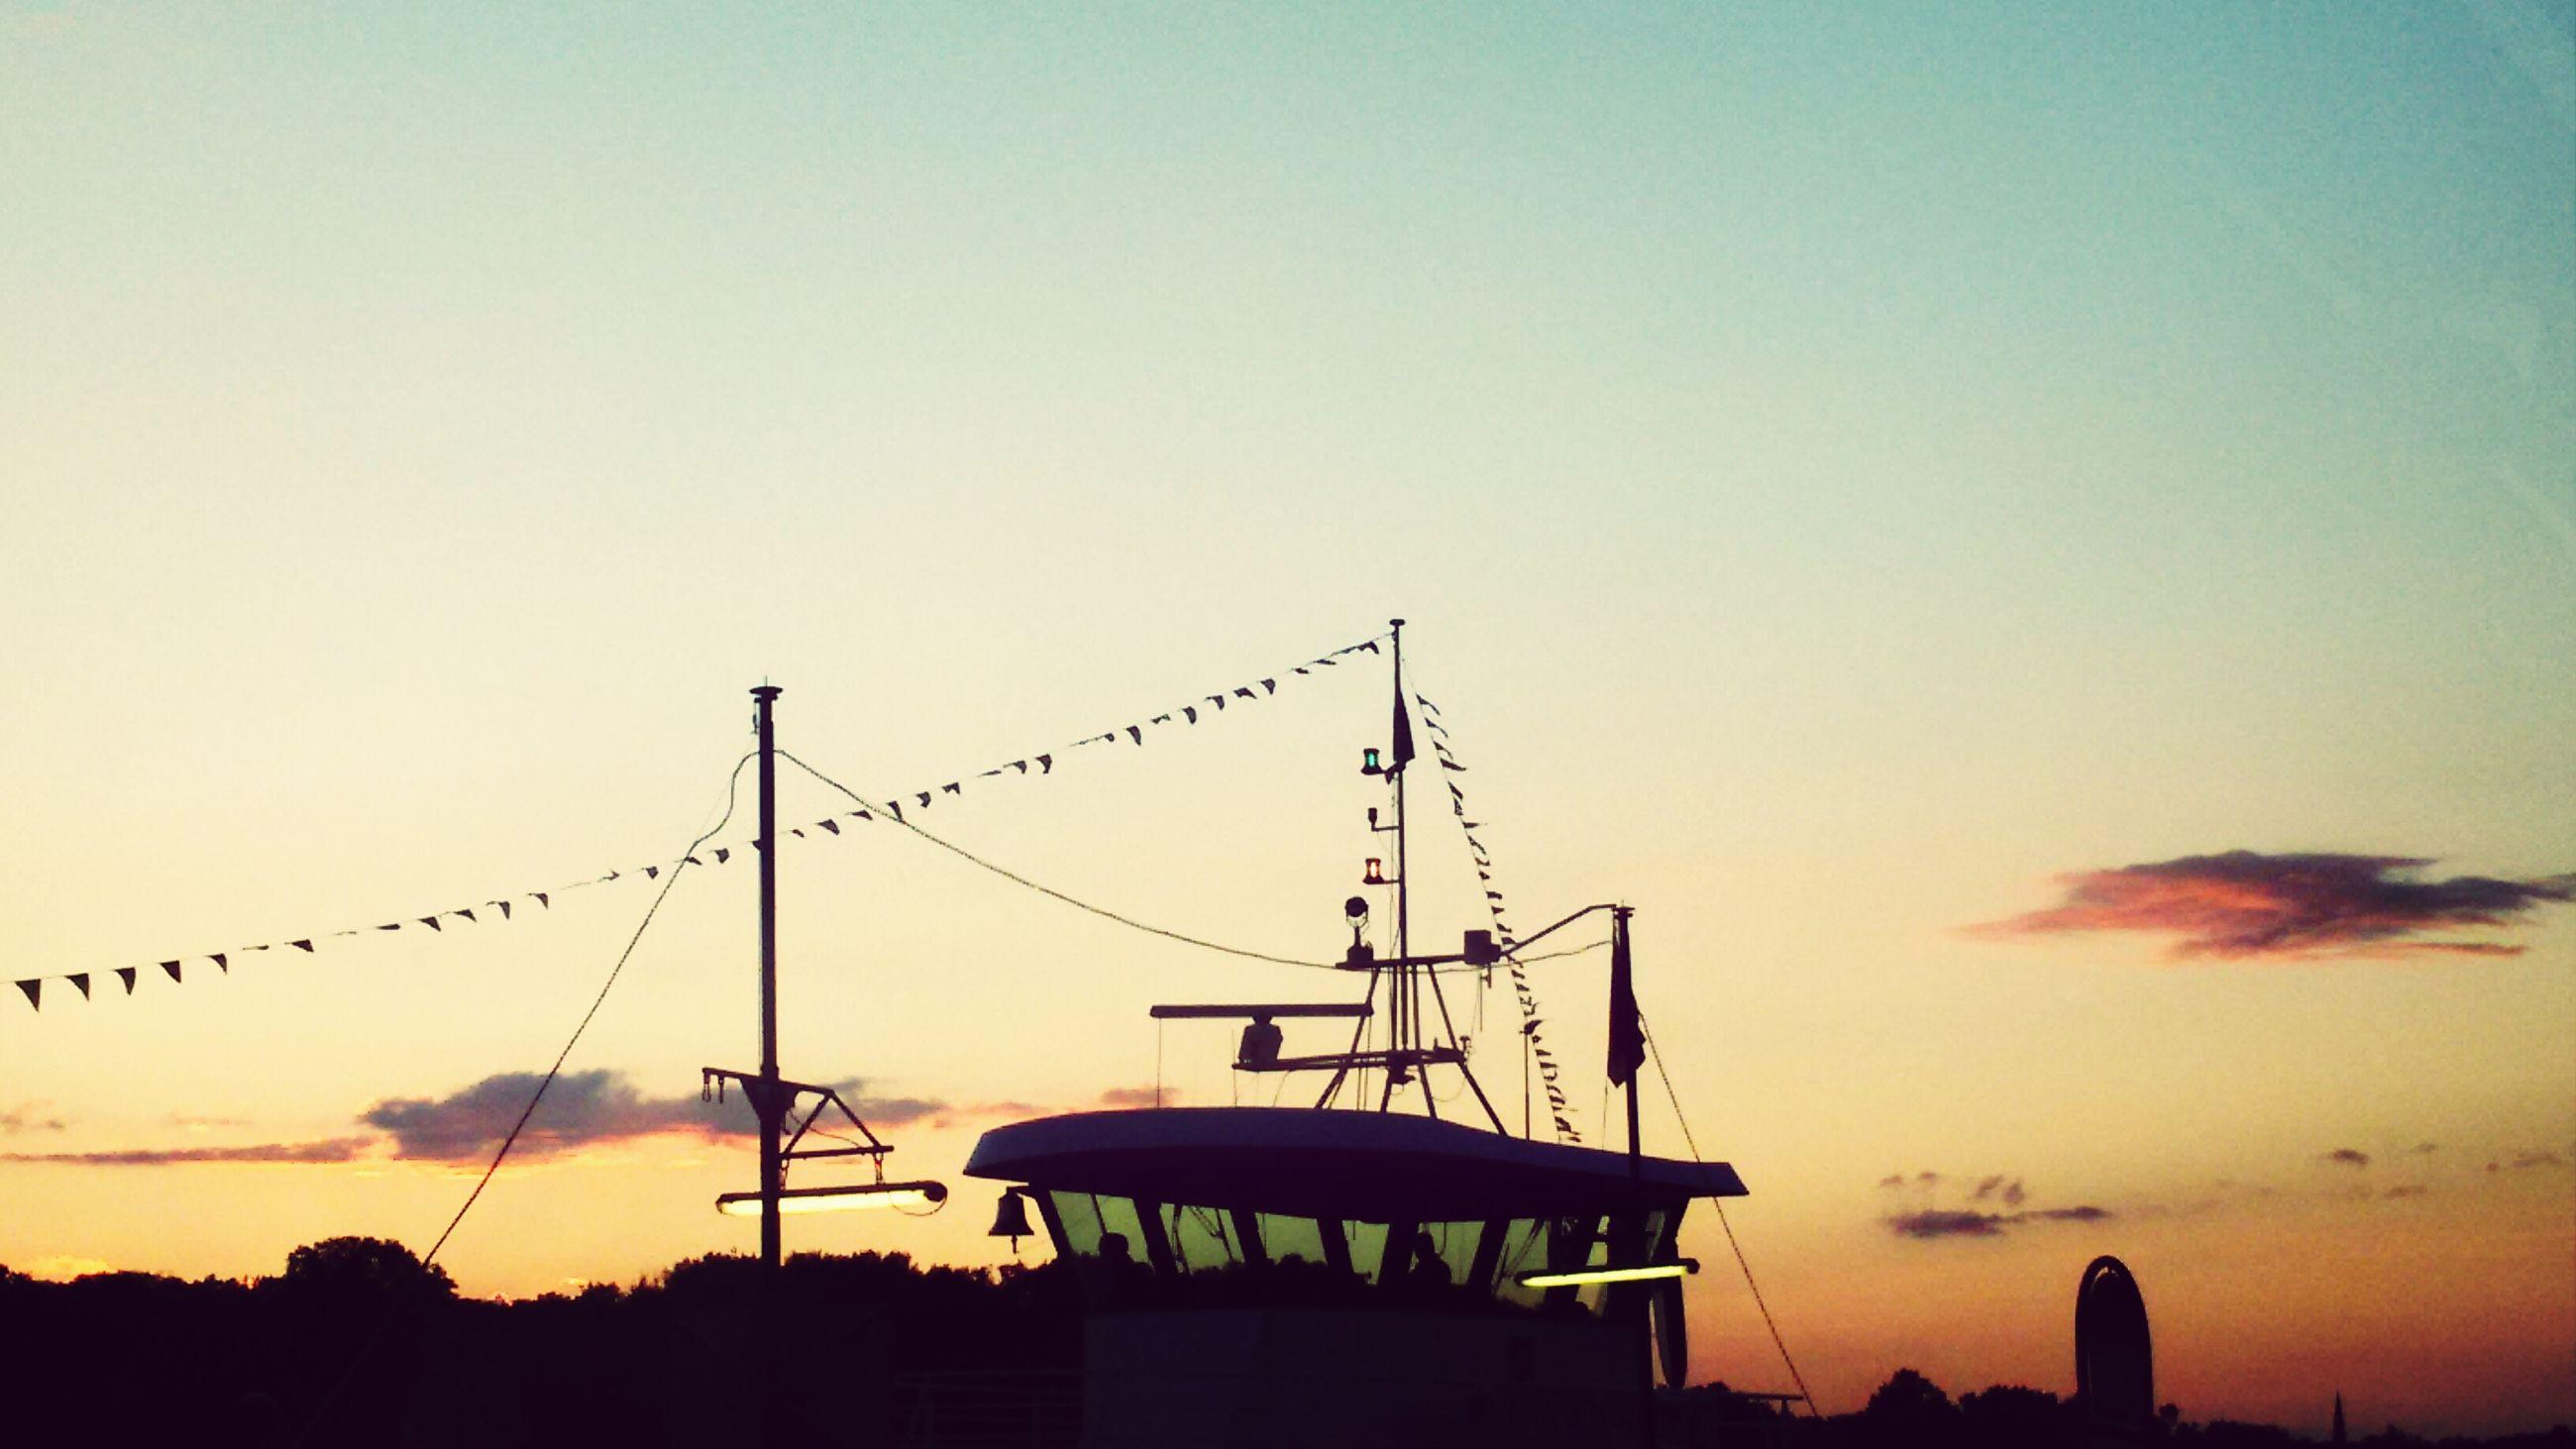 sunset, silhouette, orange color, built structure, architecture, crane - construction machinery, construction site, clear sky, building exterior, copy space, sky, development, low angle view, construction, crane, outdoors, industry, dusk, no people, construction industry